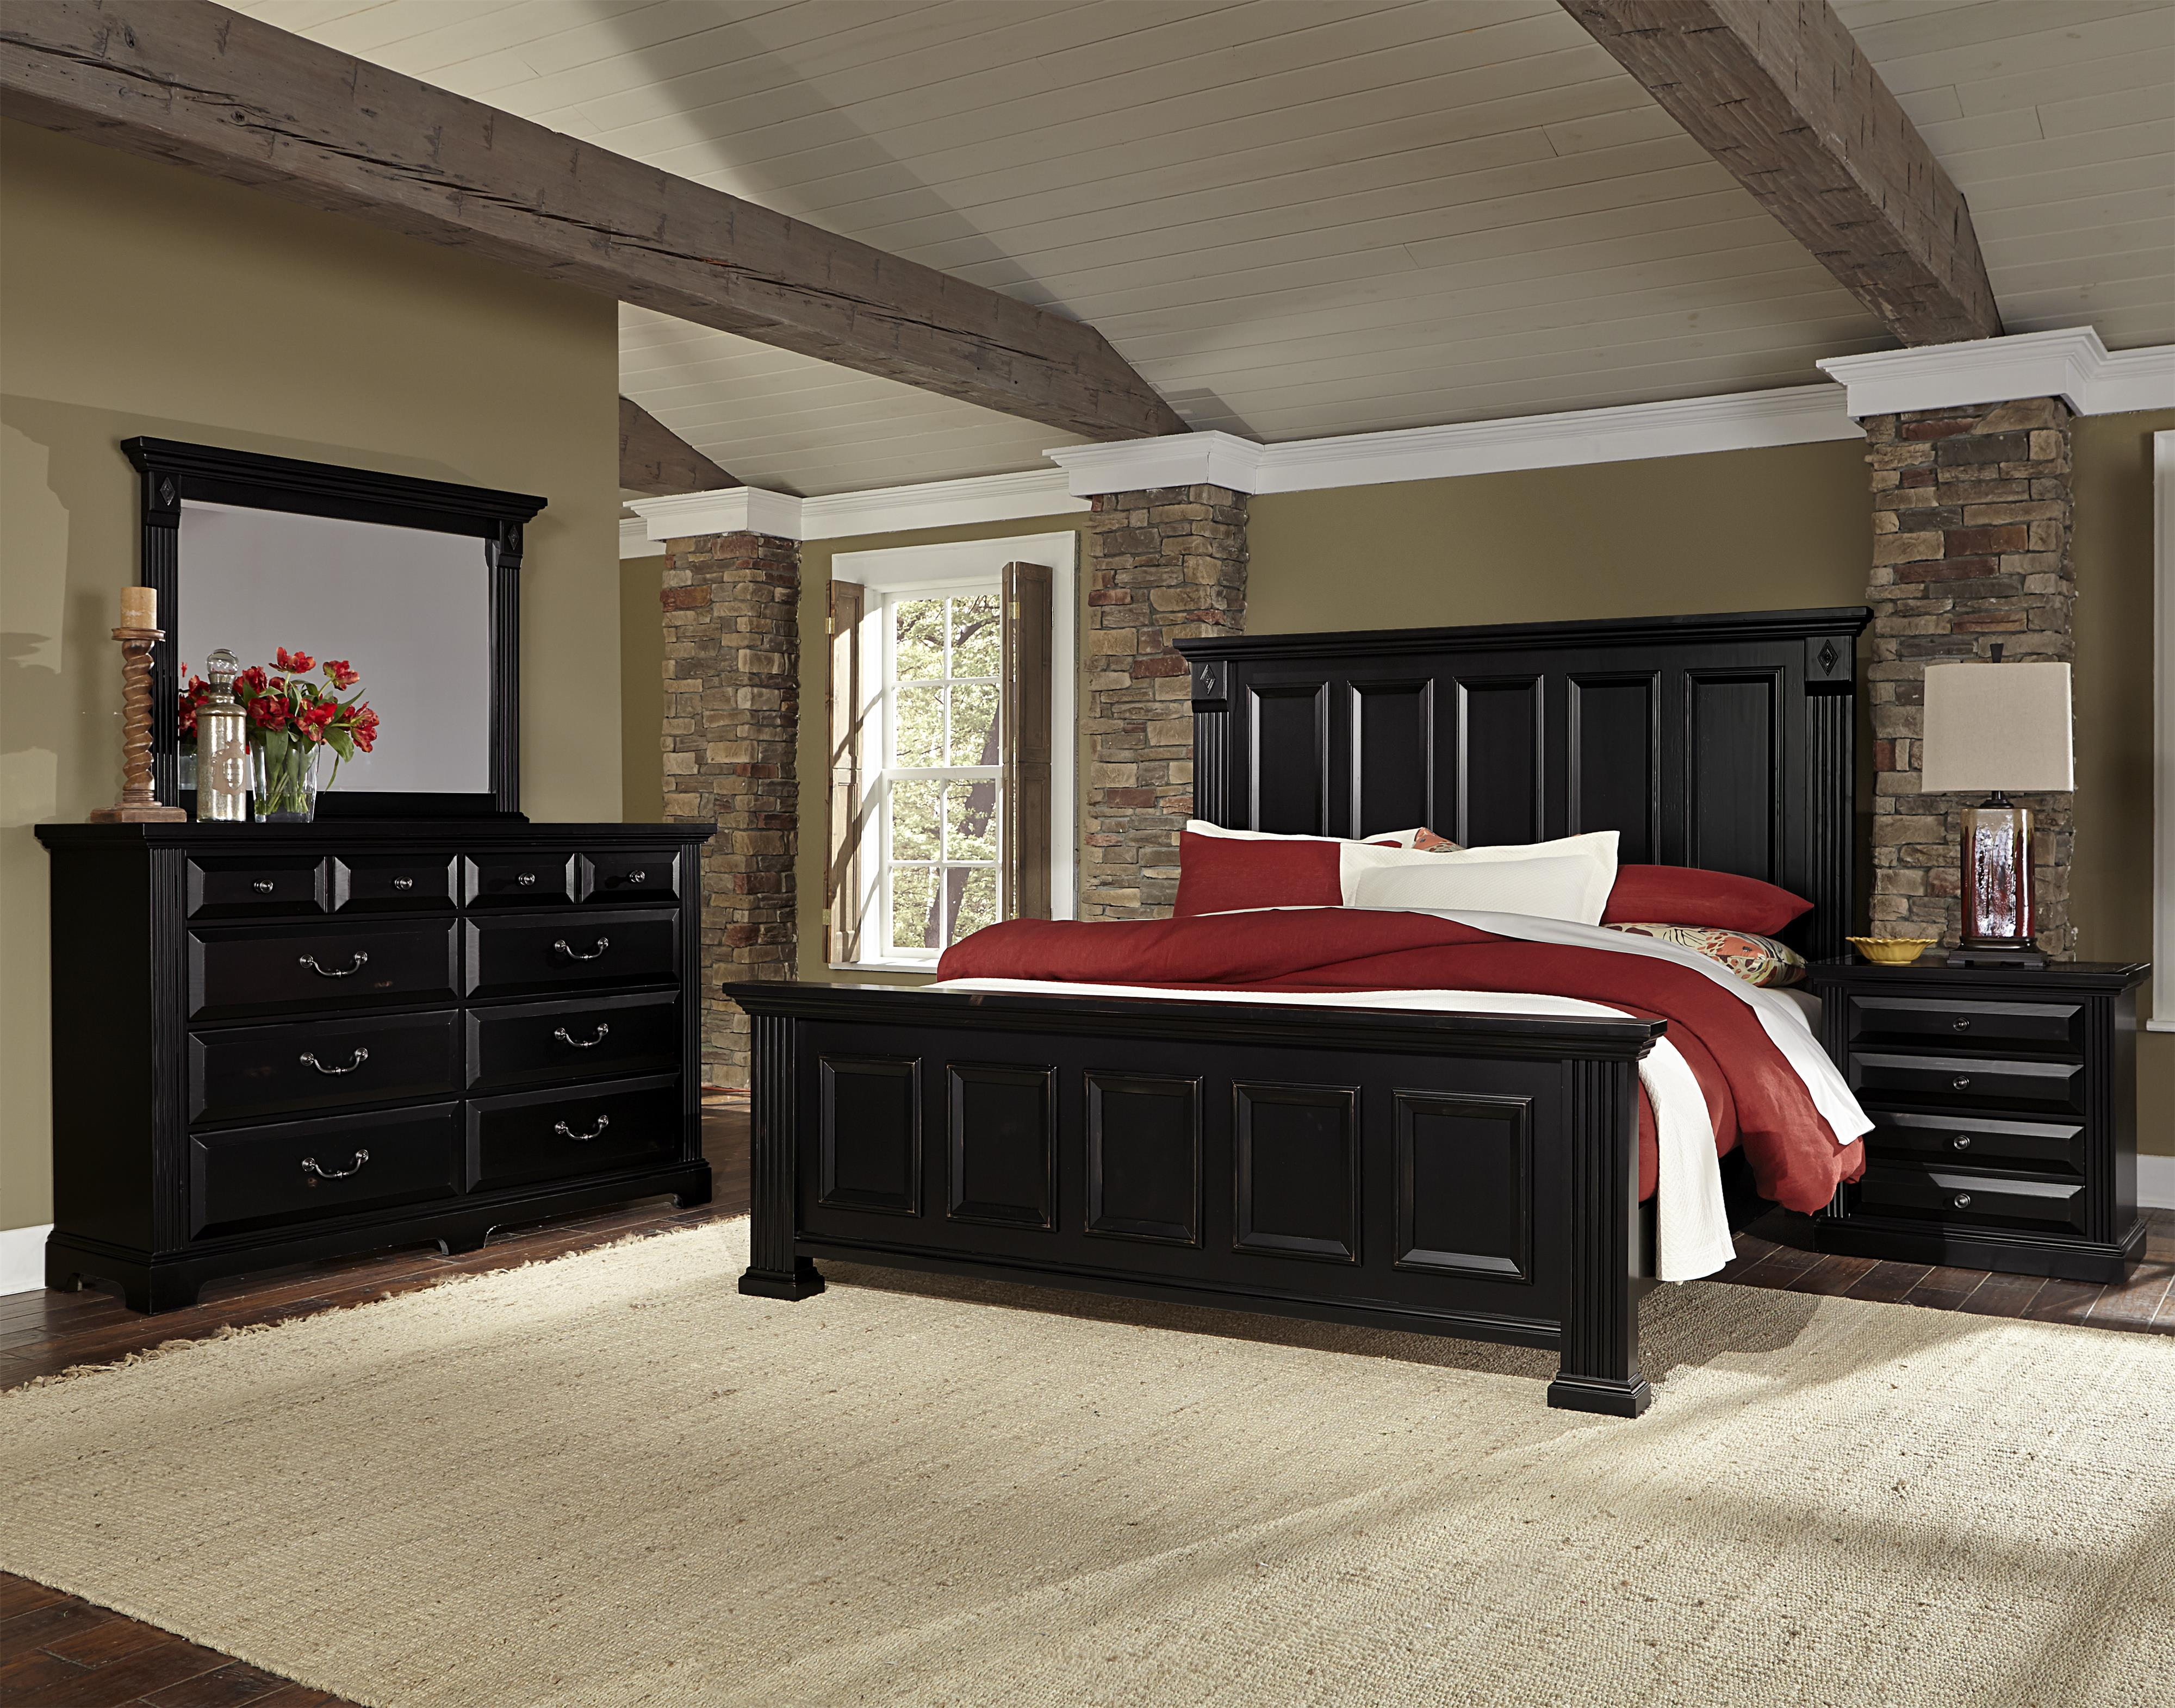 Vaughan Bassett Woodlands King Bedroom Group - Item Number: BB99 K Bedroom Group 2